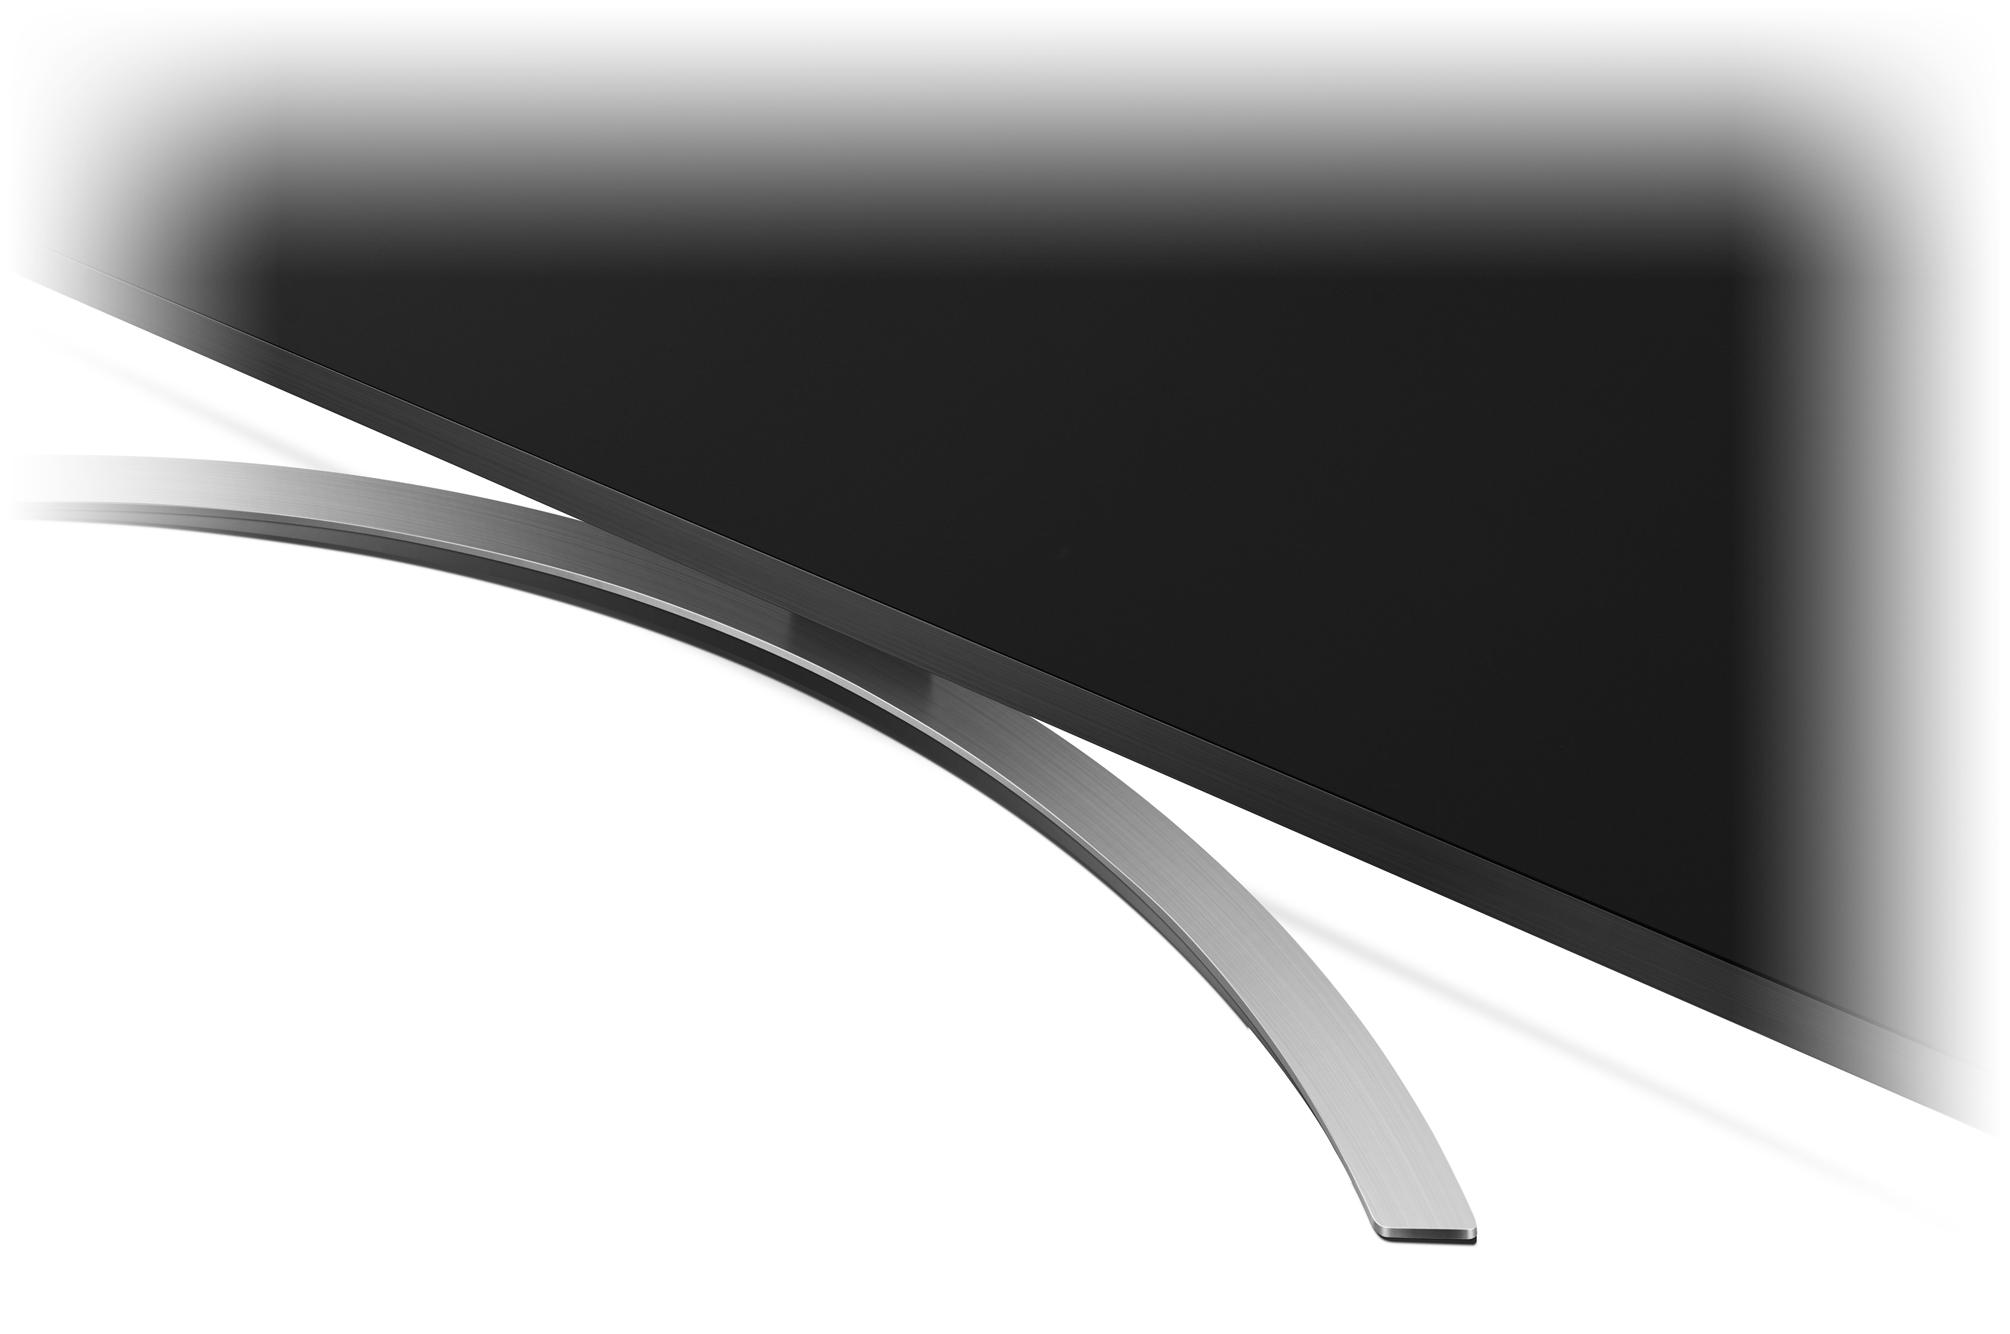 LG Pro:Centric SMART 75UT770H (NA) 10